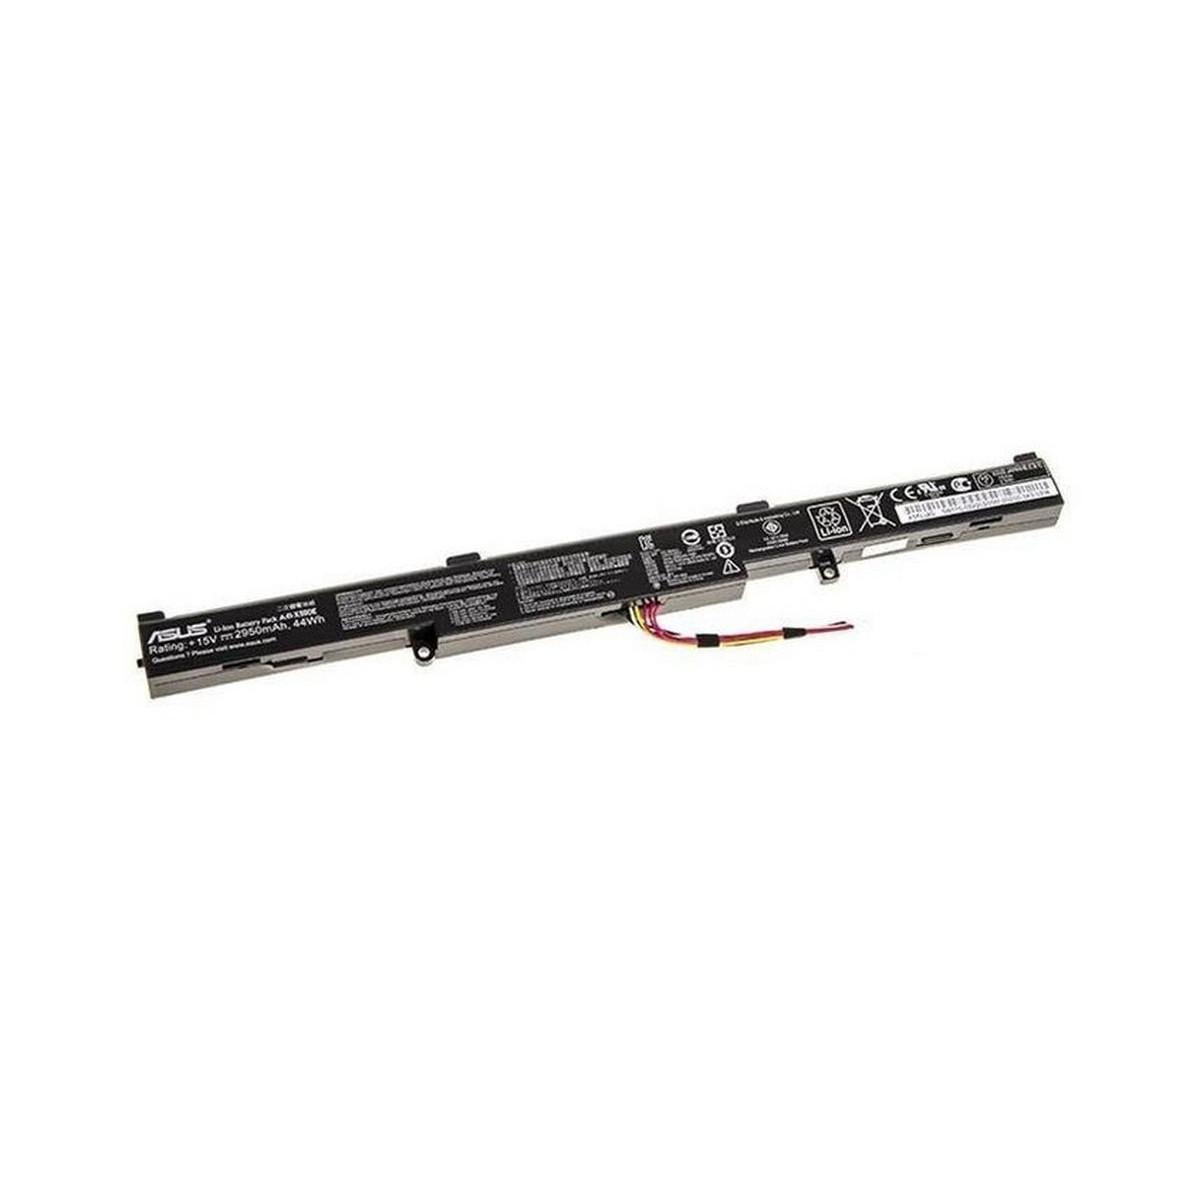 BATERIA ASUS X550E A550 F550 K550 R510 A41-X500E